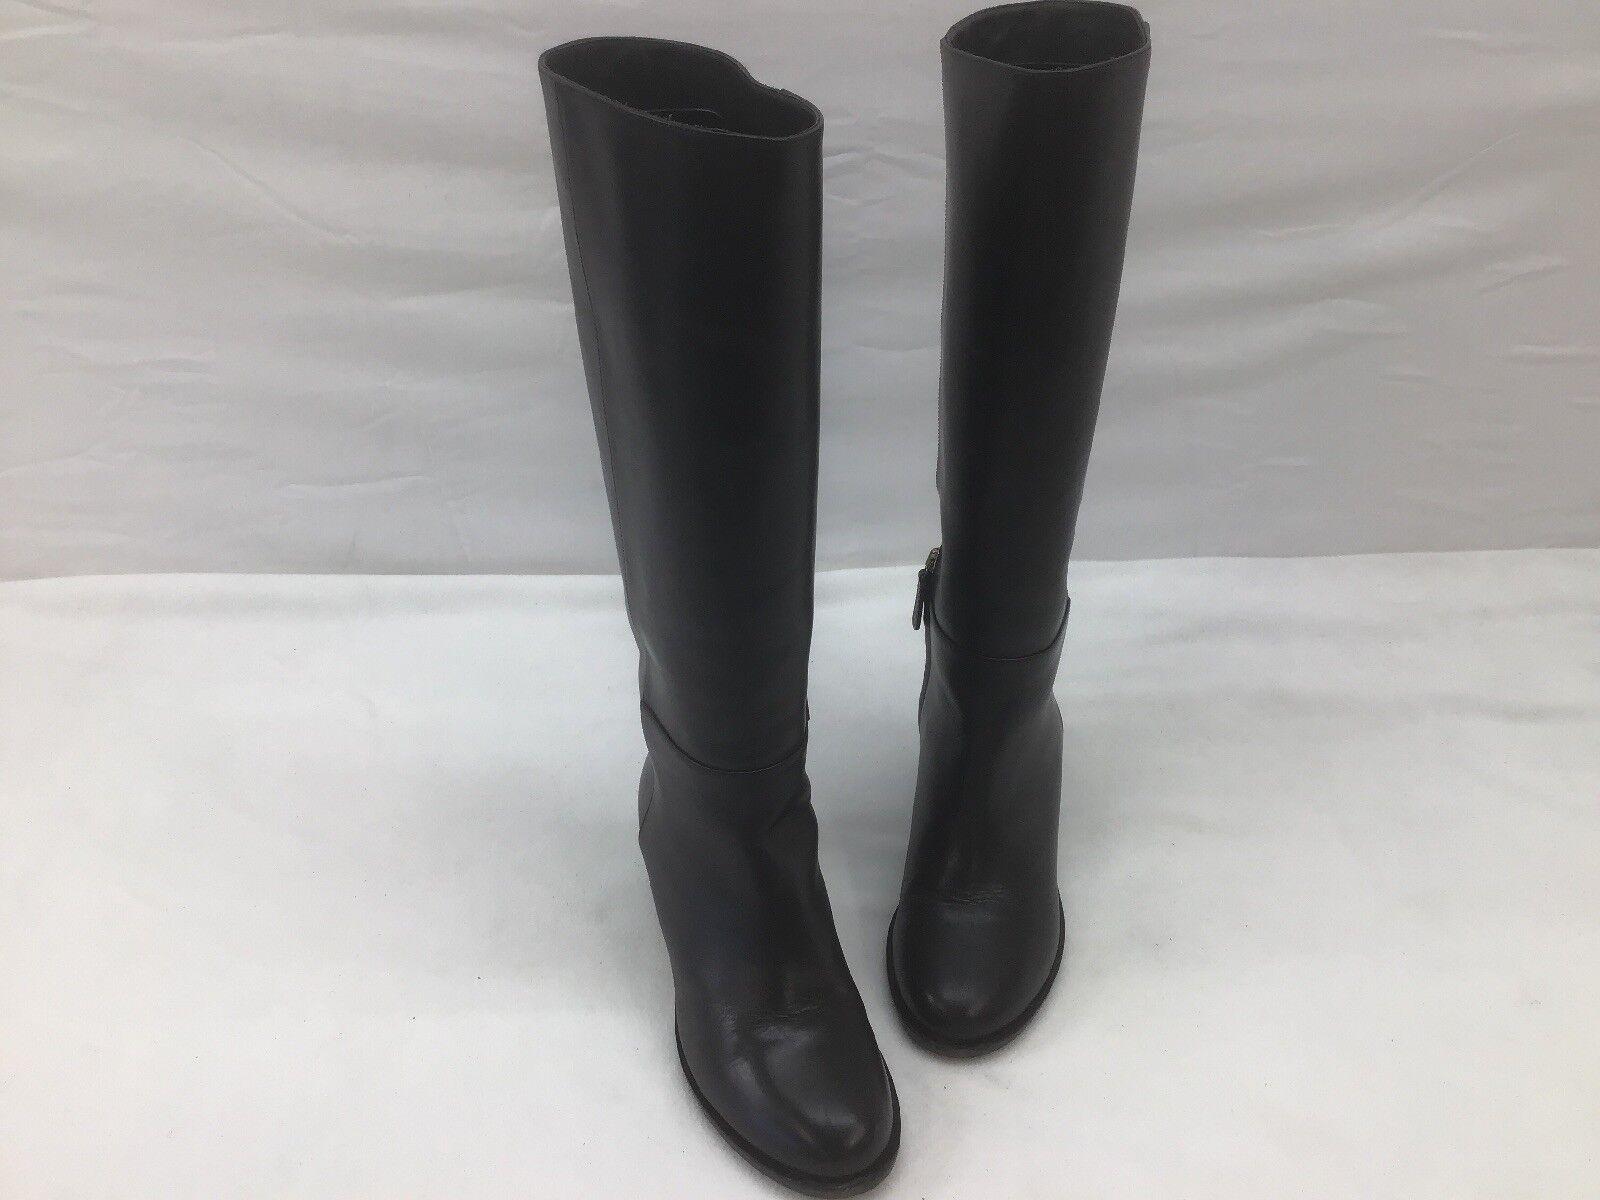 Max Mara Ozono braun Leather Knee High Stiefel Größe 38M F1136